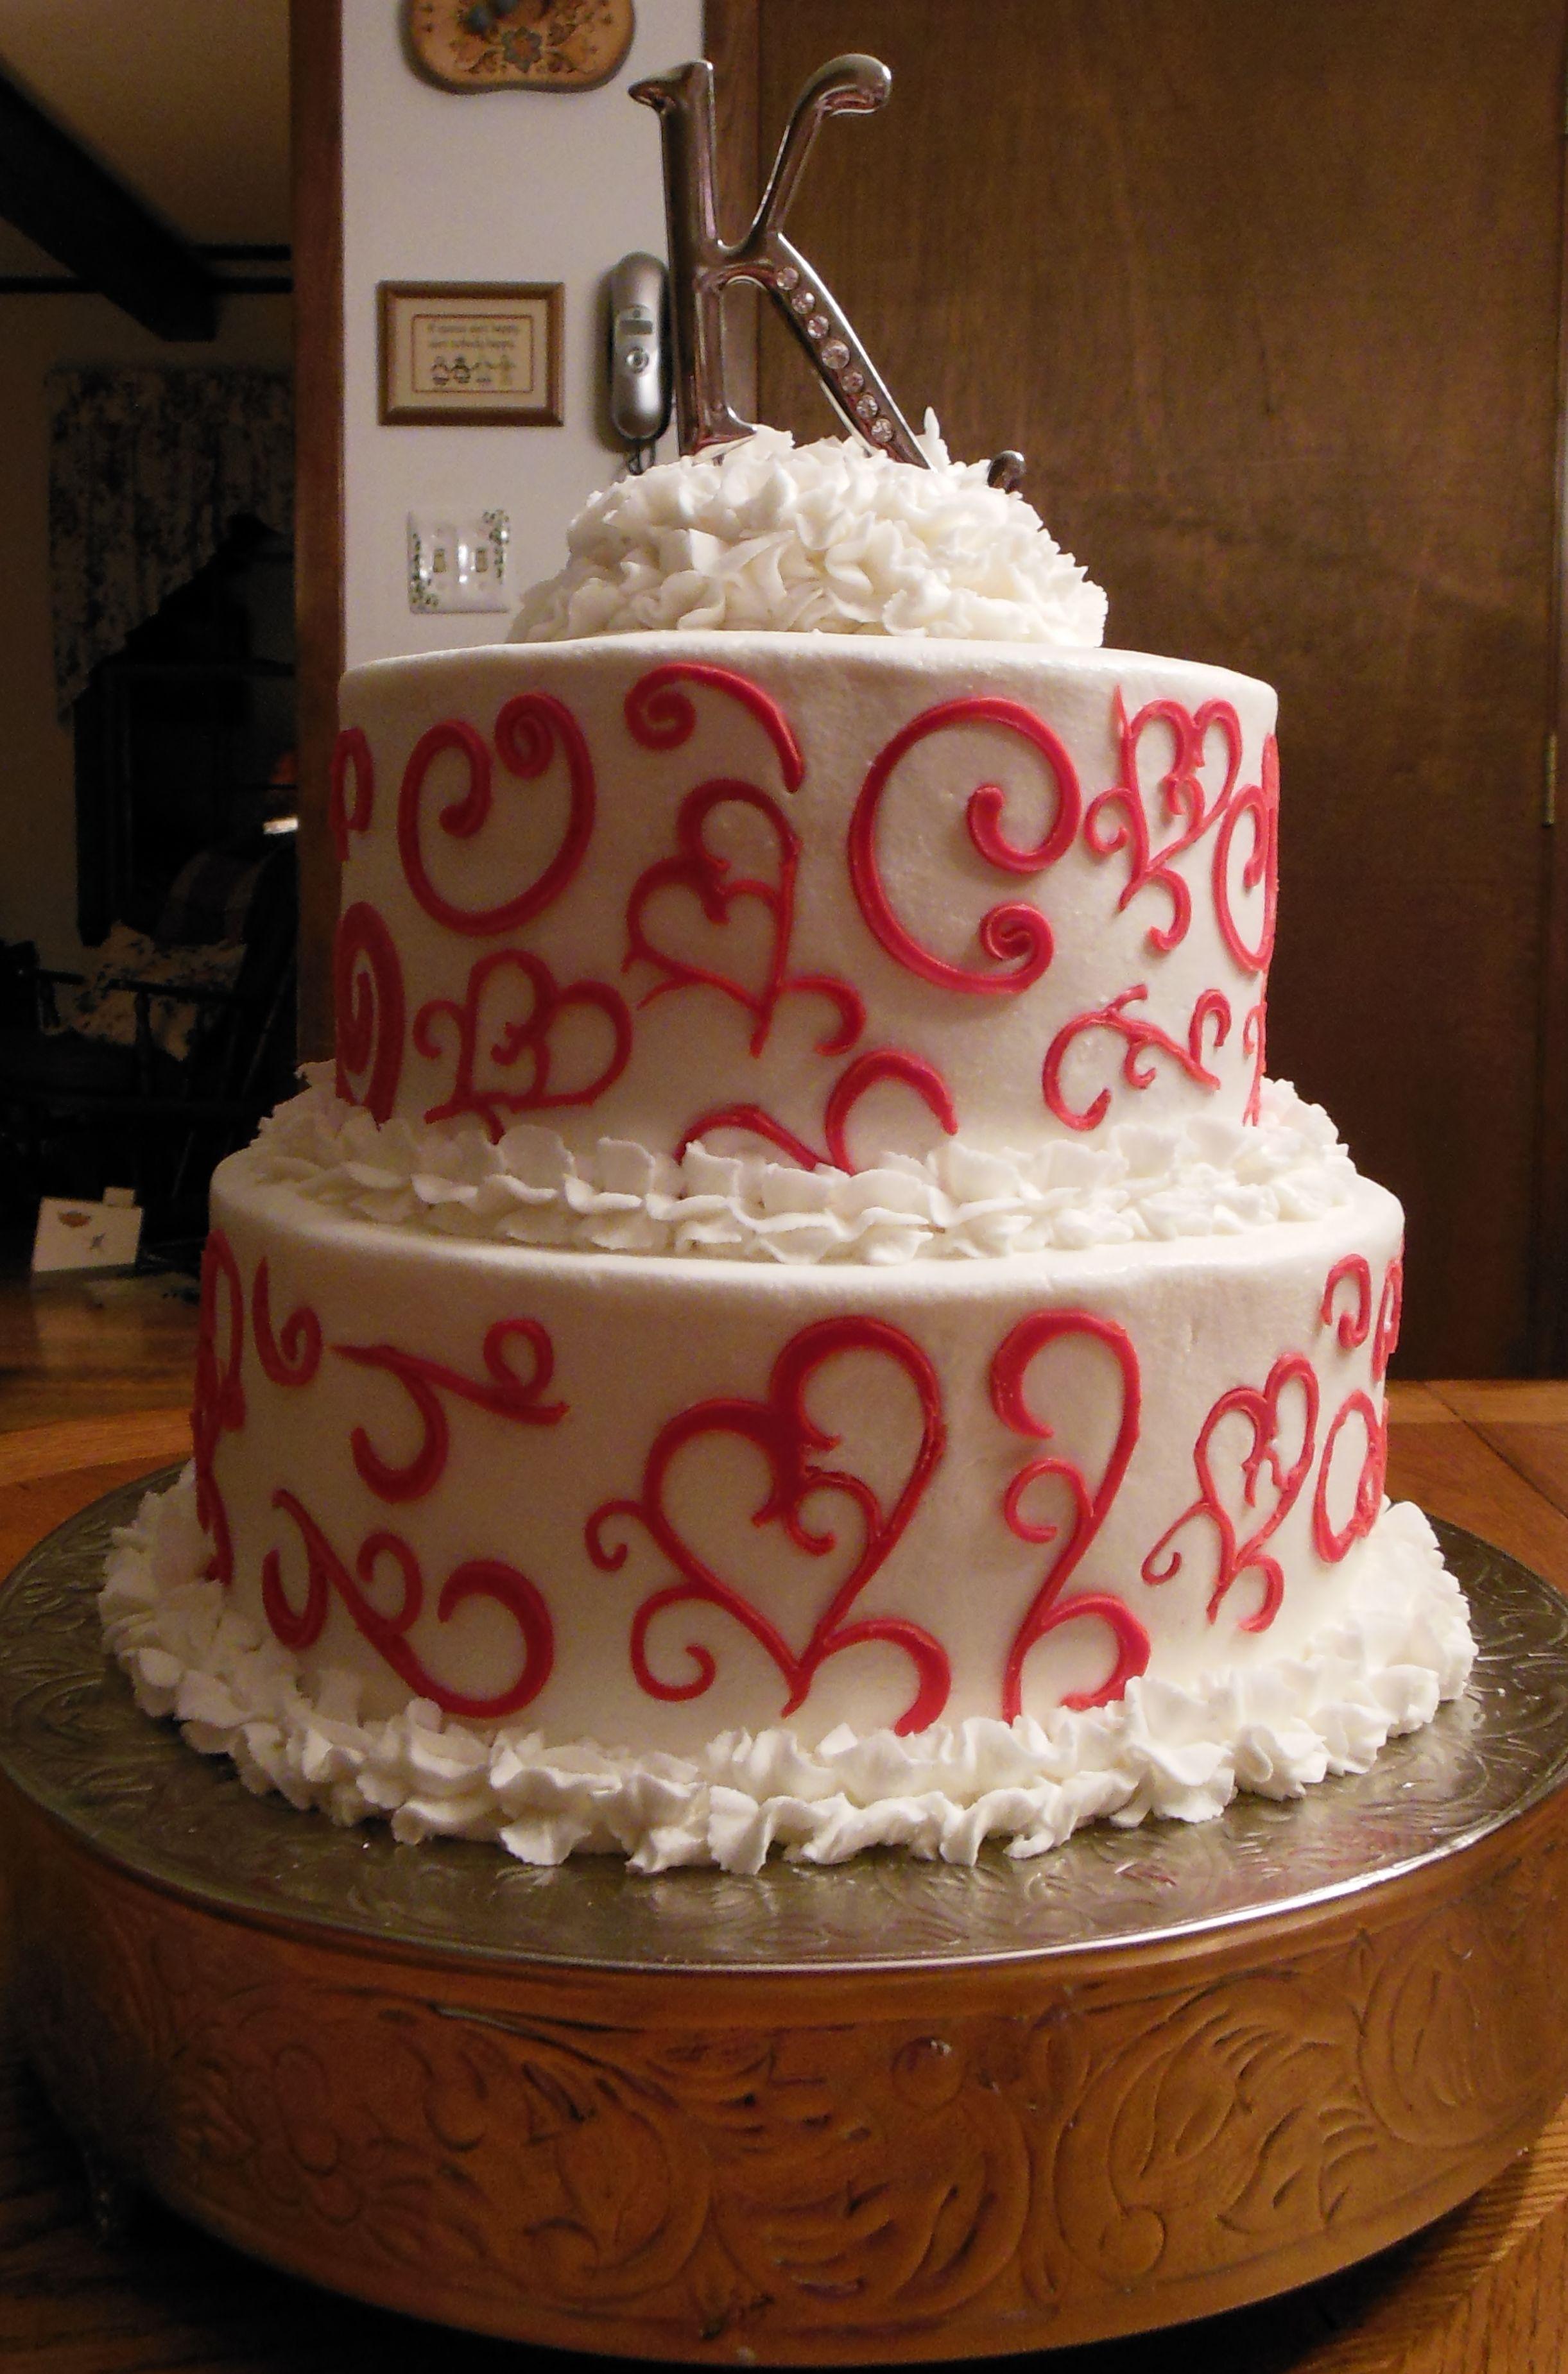 Valentine S Day Wedding Cake 10 8 Round Iced In Buttercream With